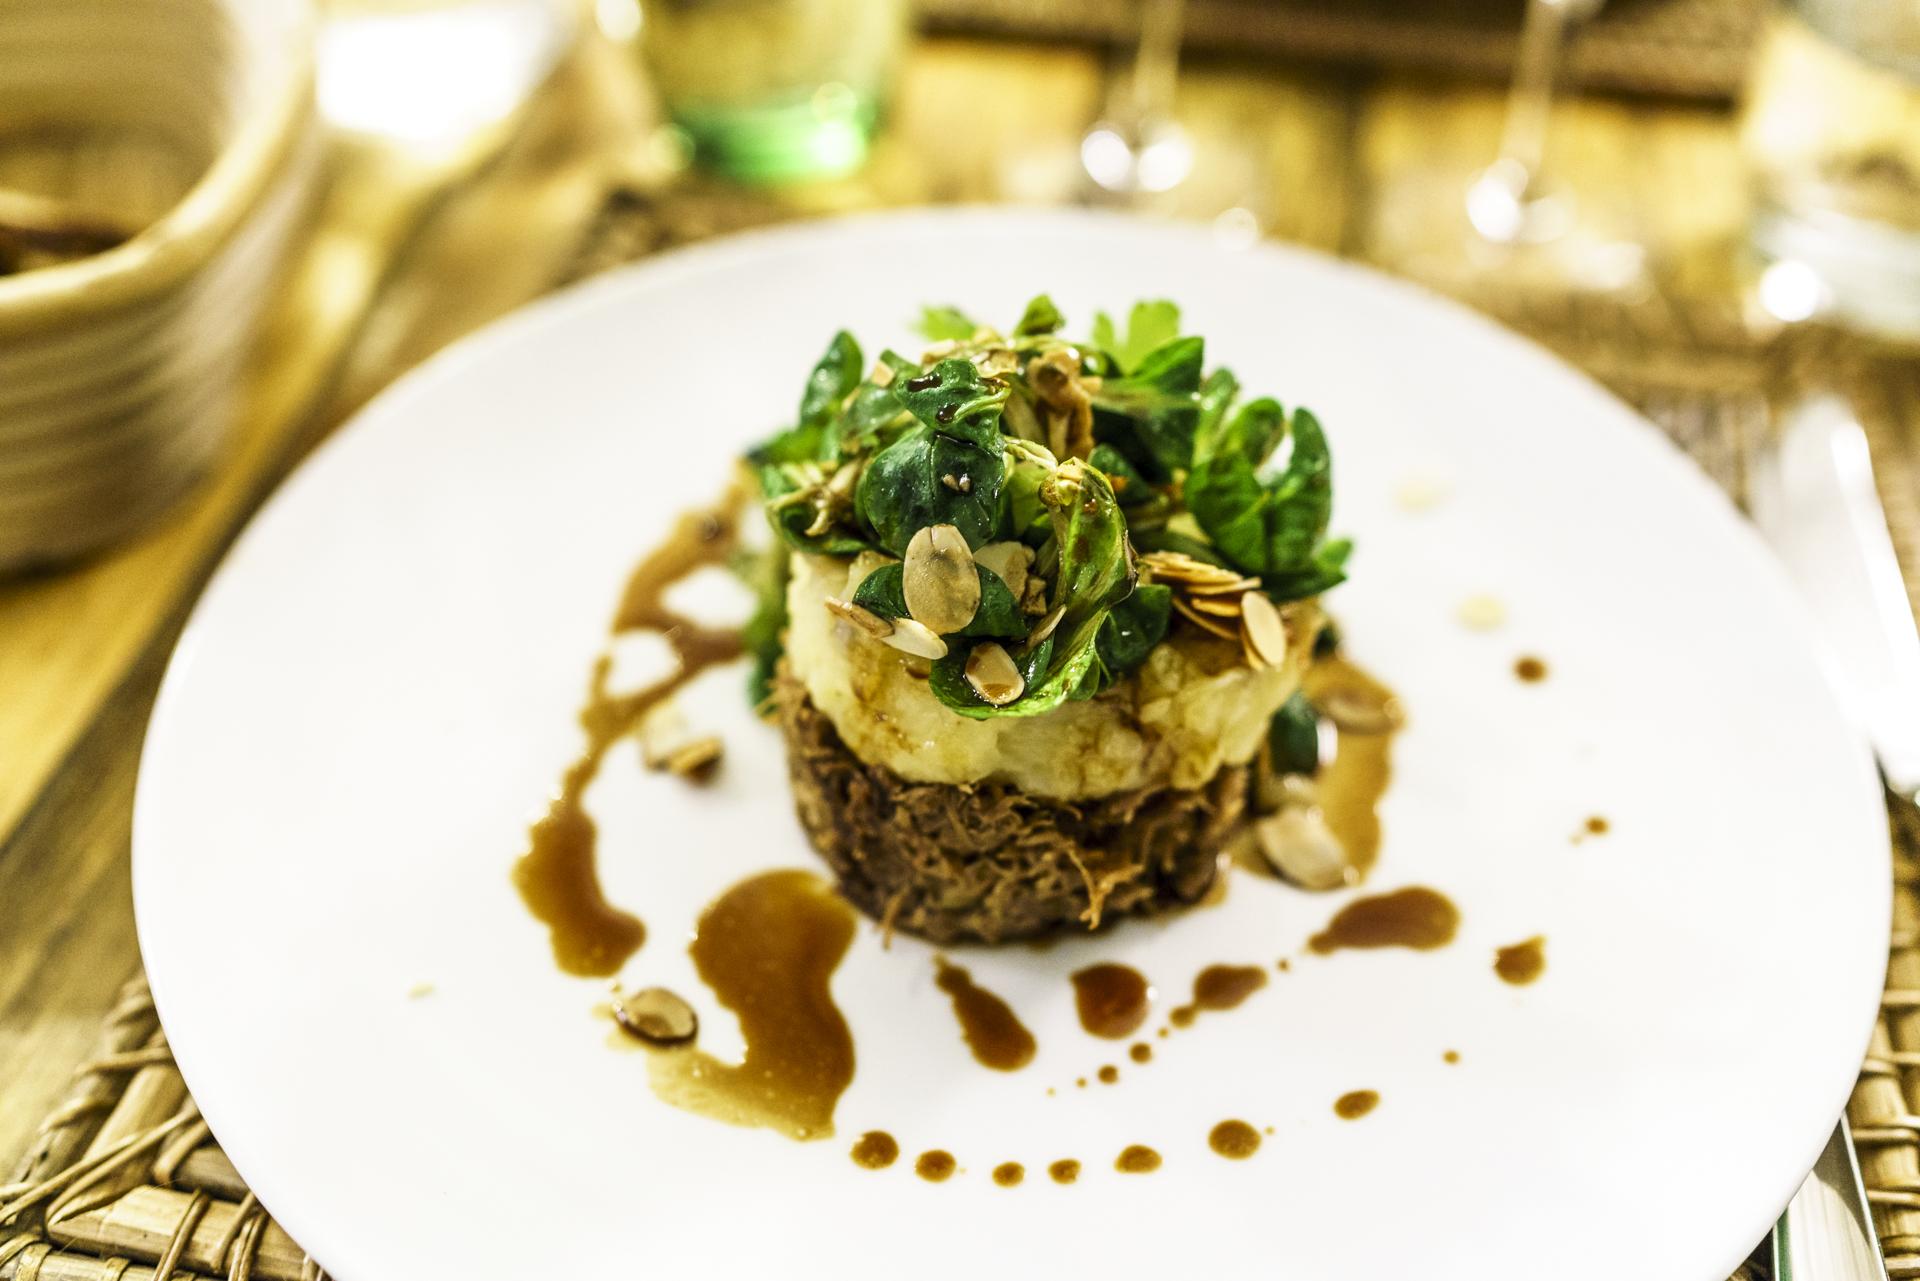 Restaurant Le Jardin in Bormes-les-Mimosas